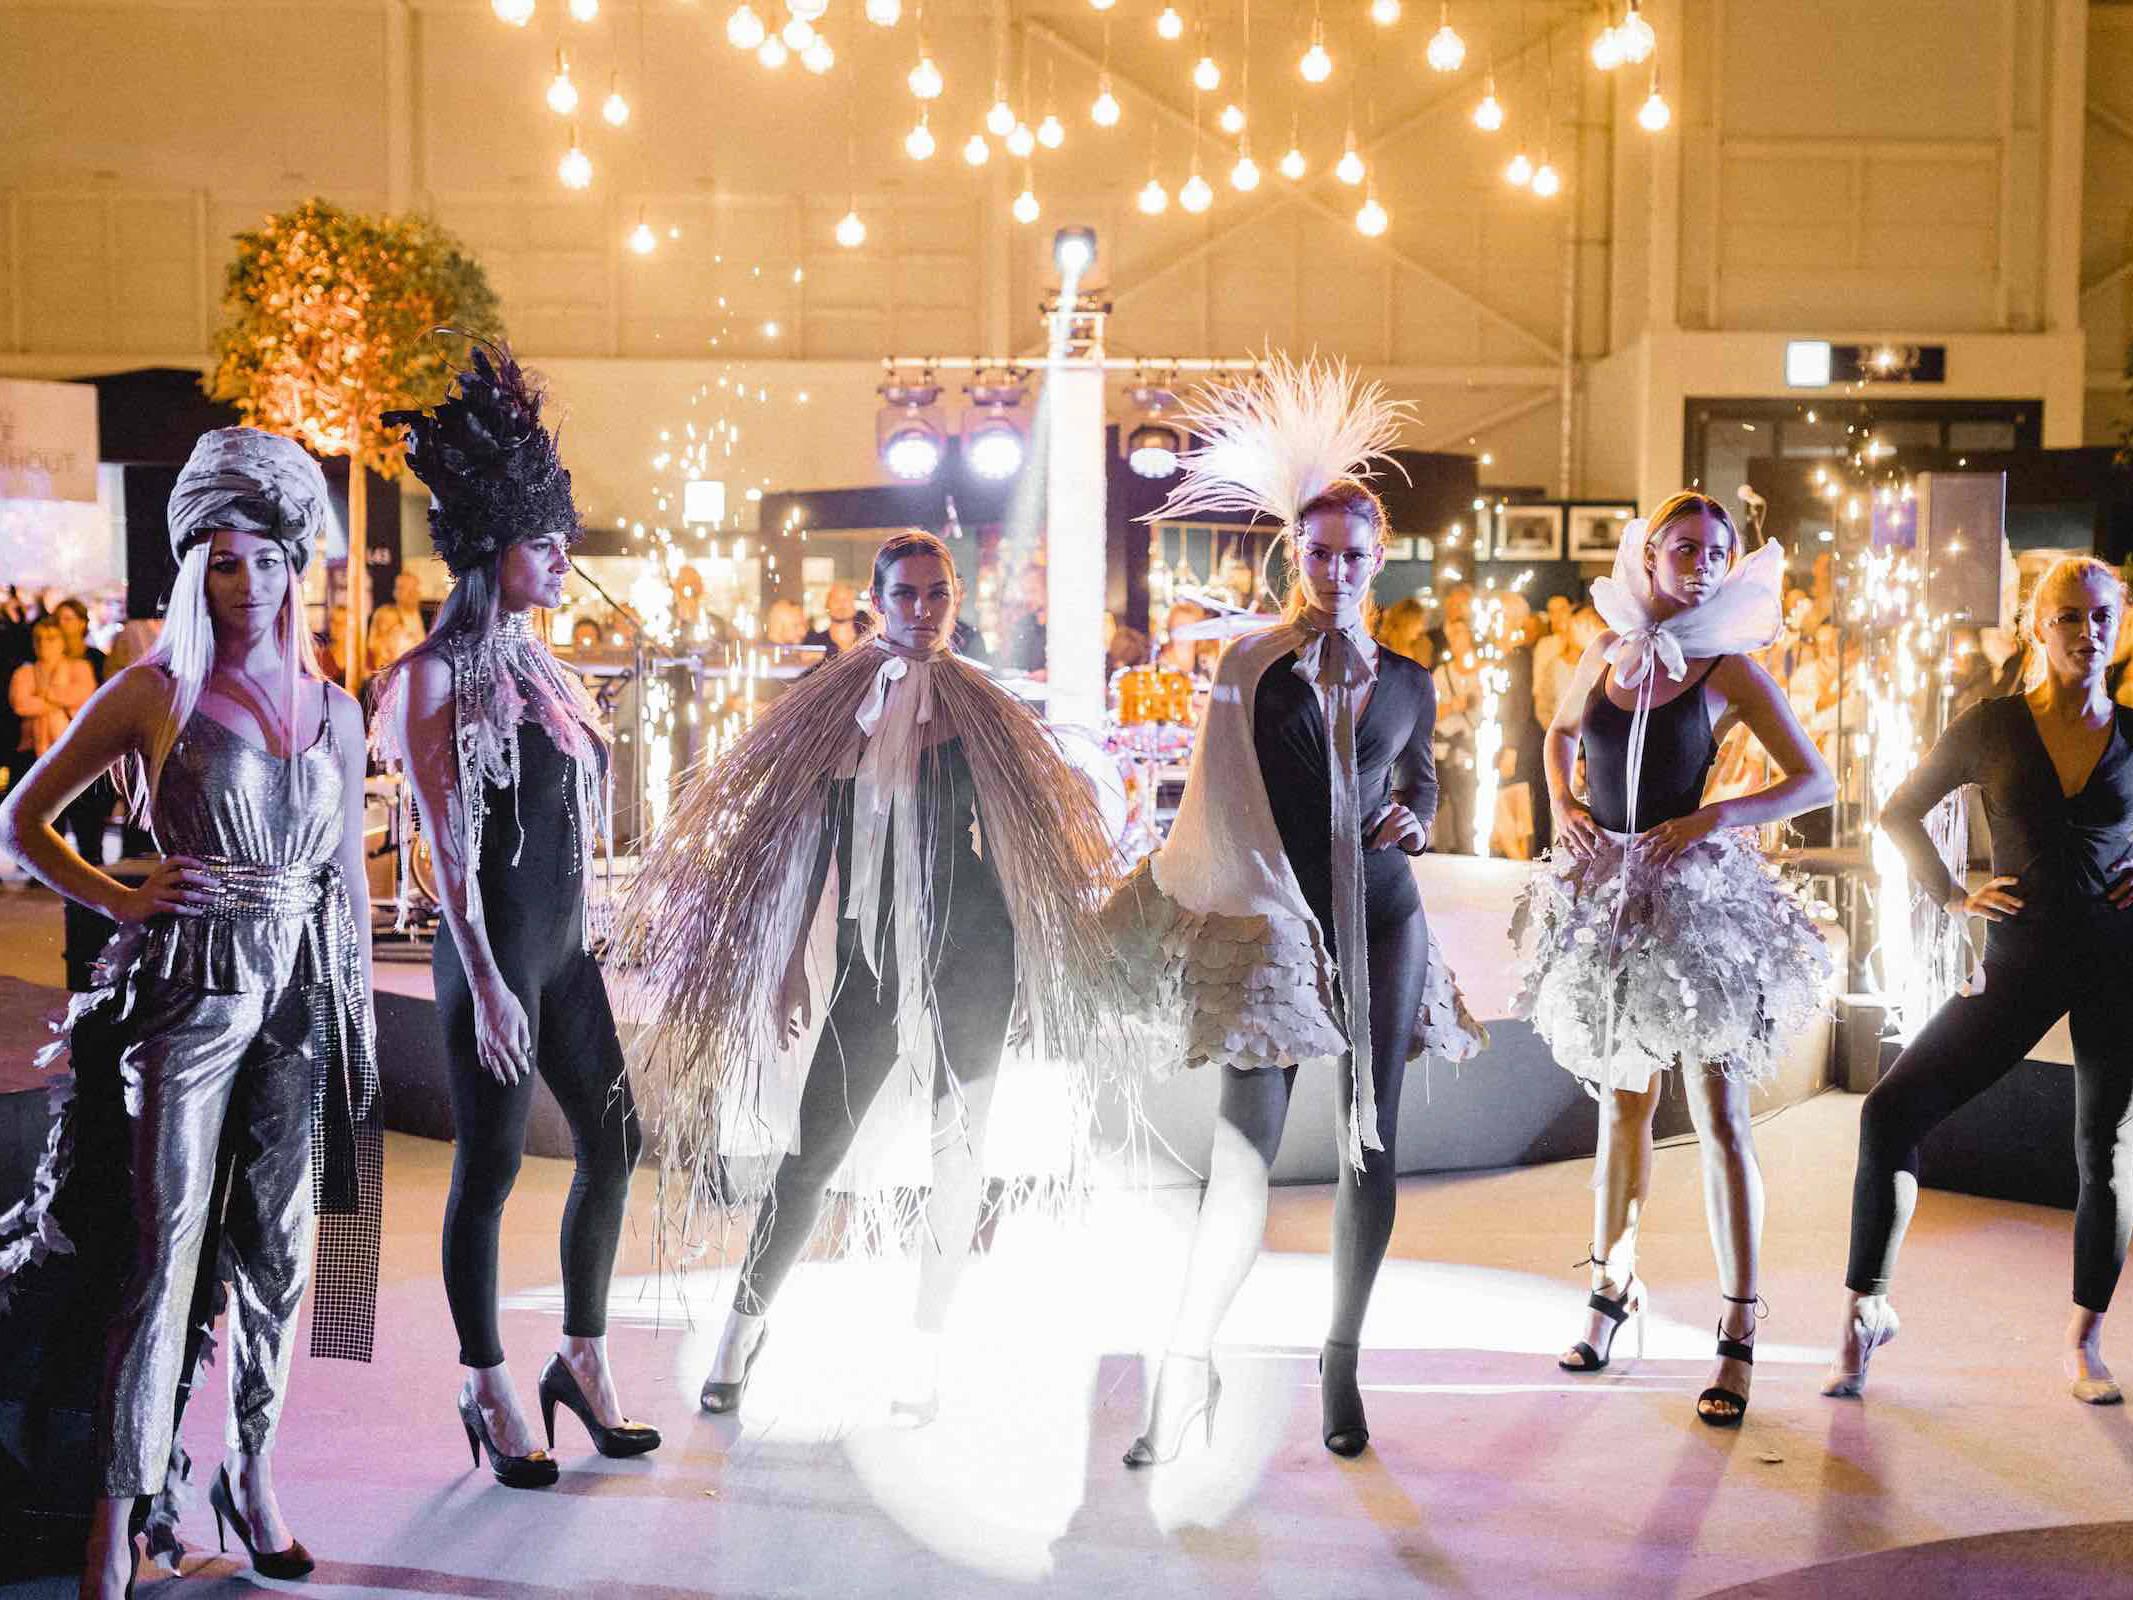 Eventplanung | Eventausstatung | Hamburg | Kongresse | Shows | Galas | Modenschauen | Produktpräsentationen | Bühnen | Licht | Tontechnik | Veranstaltungslogistik | Catering | Programmgestaltung | Künstler